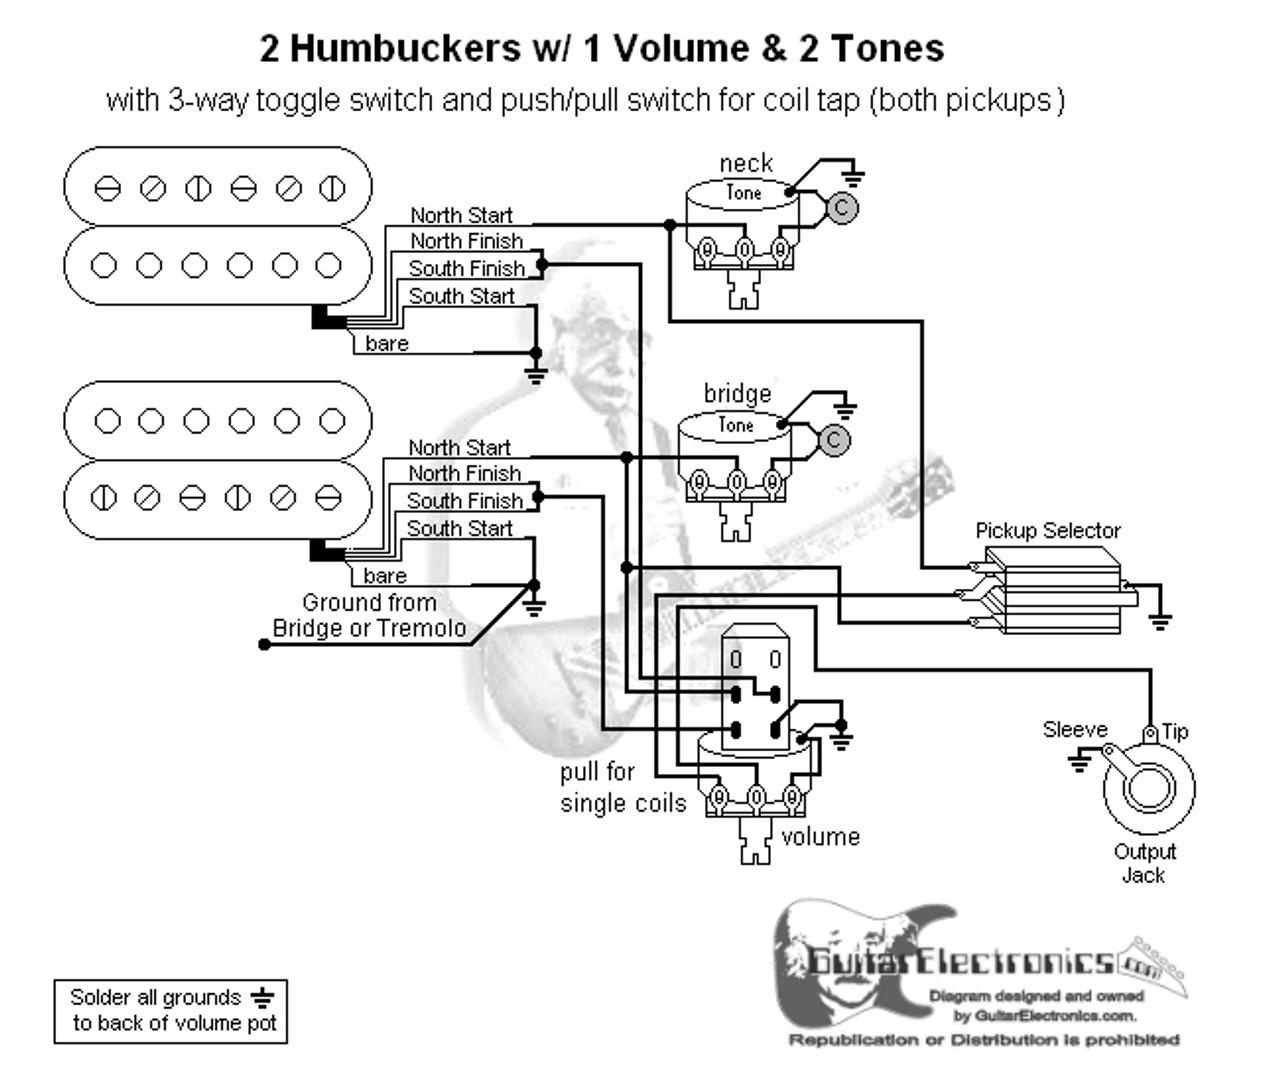 2 humbuckers 3 way toggle switch 1 volume 2 tones coil tap wiring diagram 2 humbuckers 3way toggle switch 1 volume 2 tones coil [ 1280 x 1083 Pixel ]